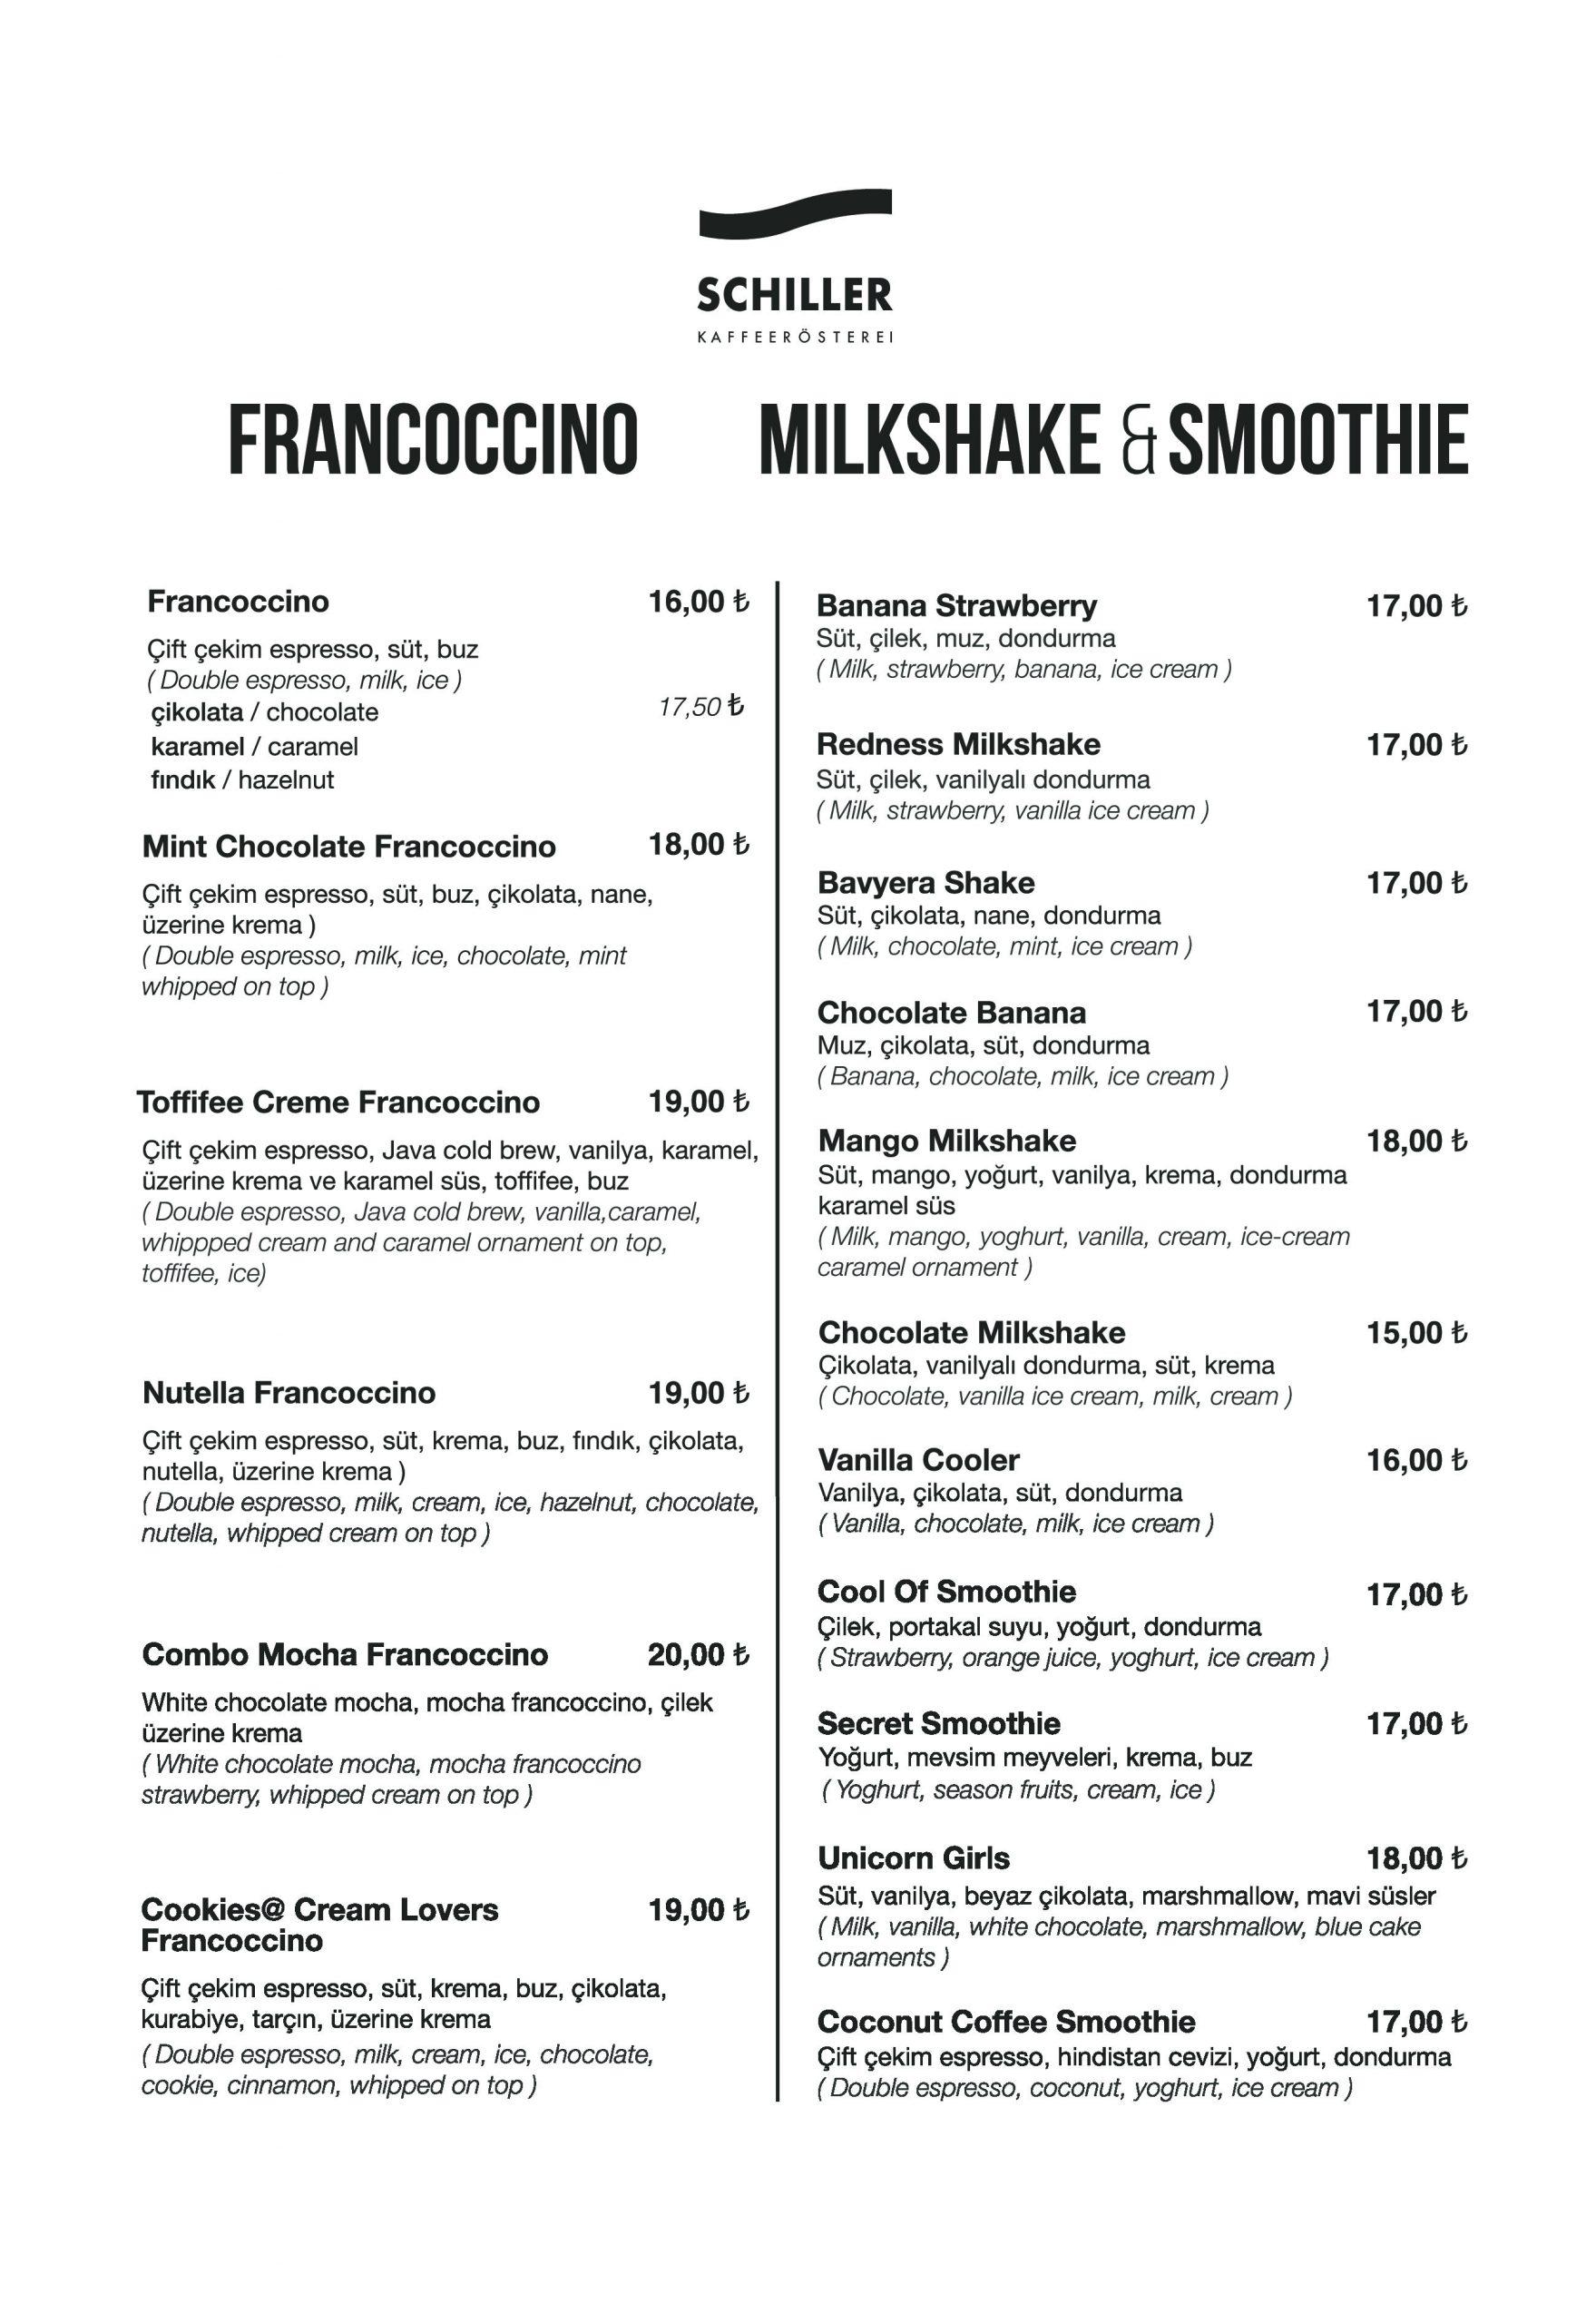 Milkshake & Smoothie